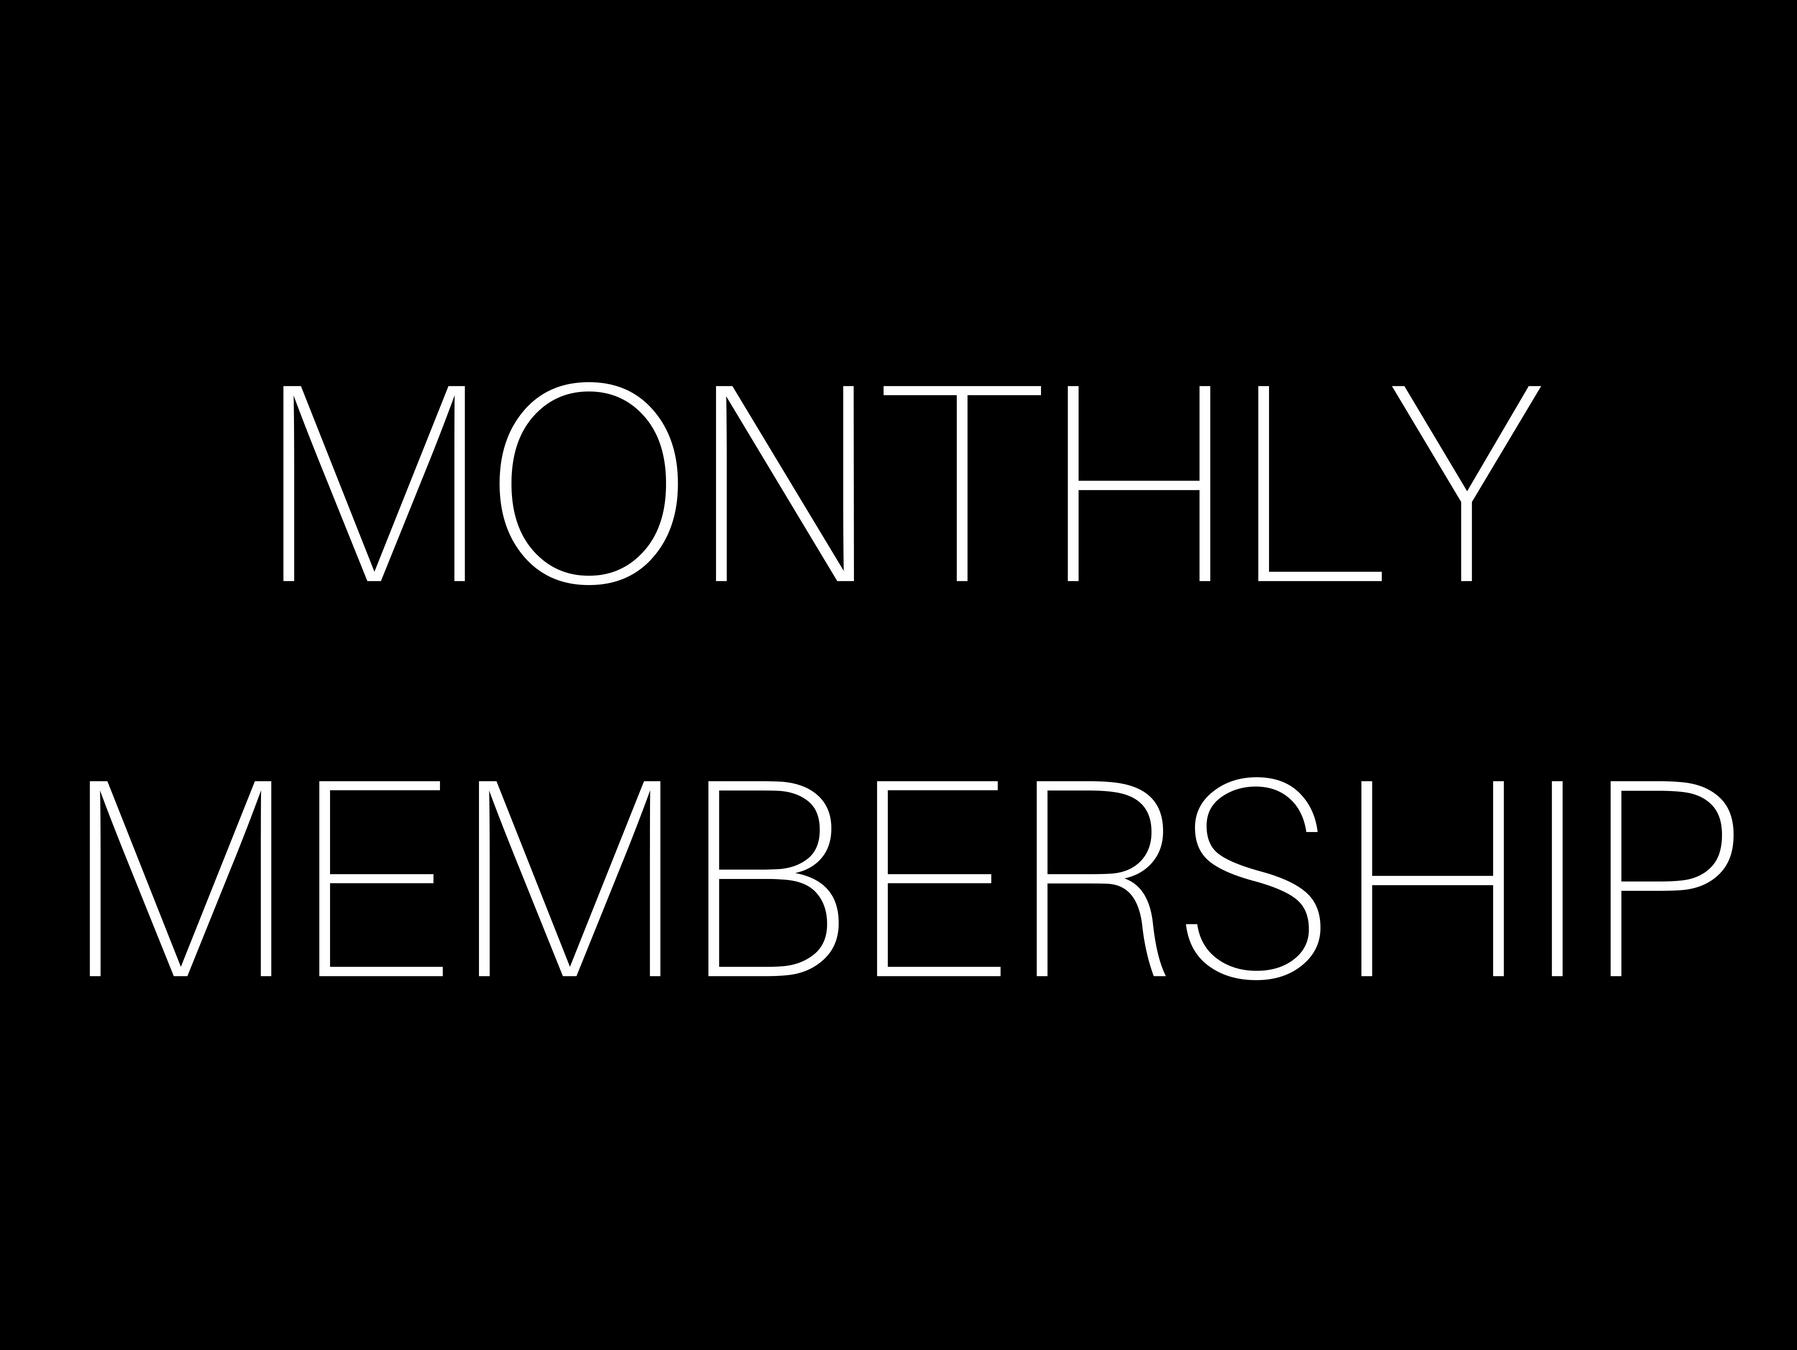 Core 3 Monthly Membership